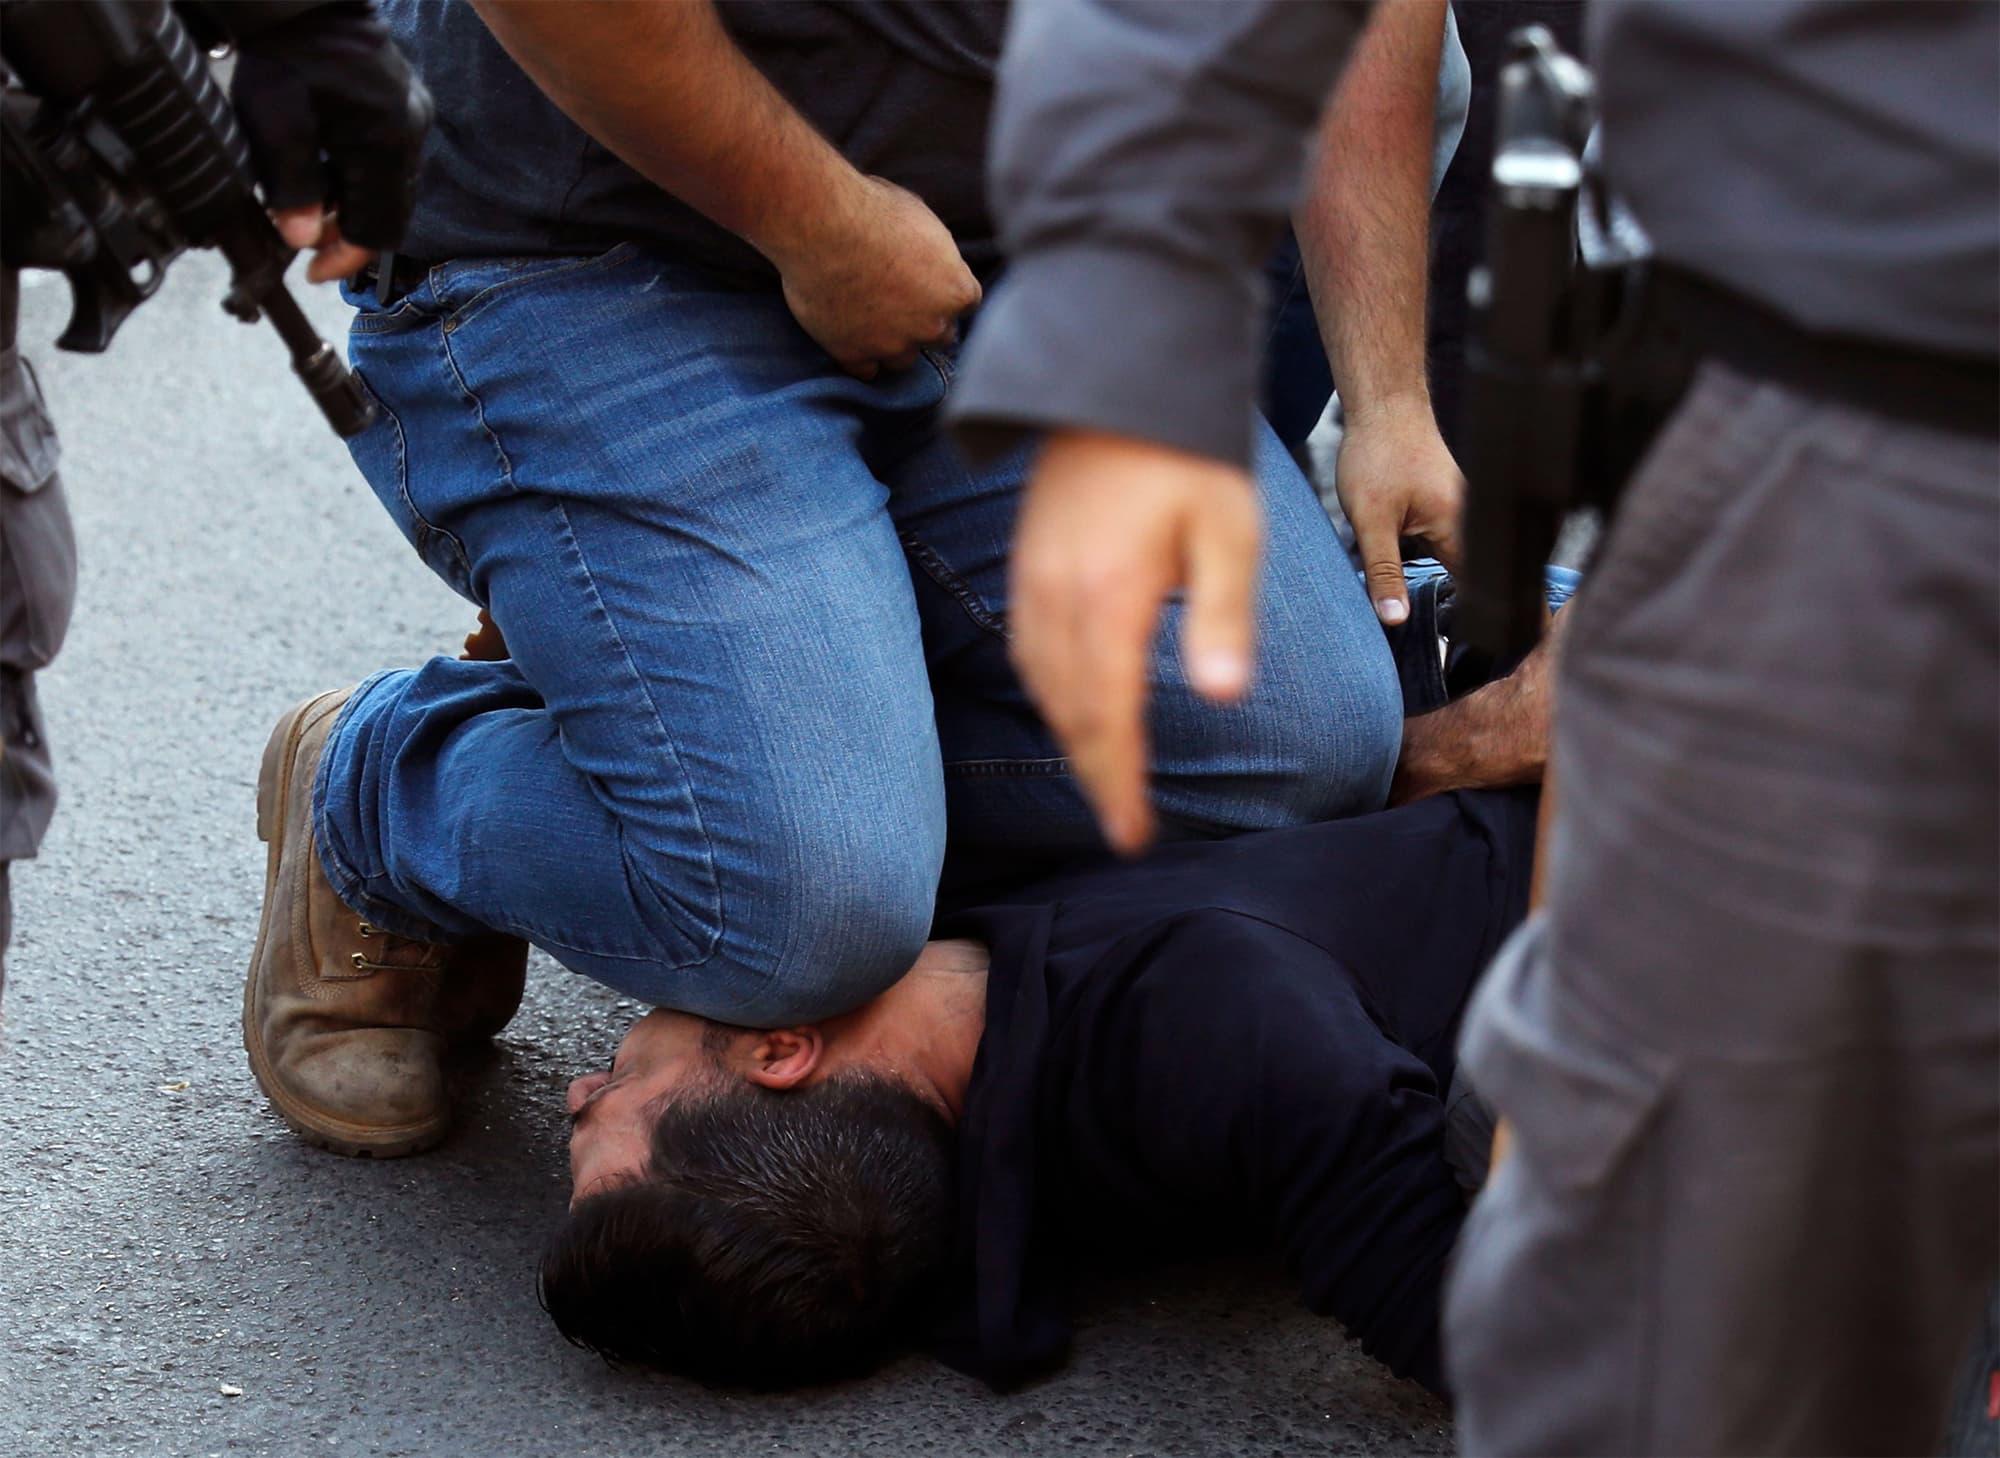 Israeli security forces arrest an Arab protestor outside the new US embassy in Jerusalem. — AFP